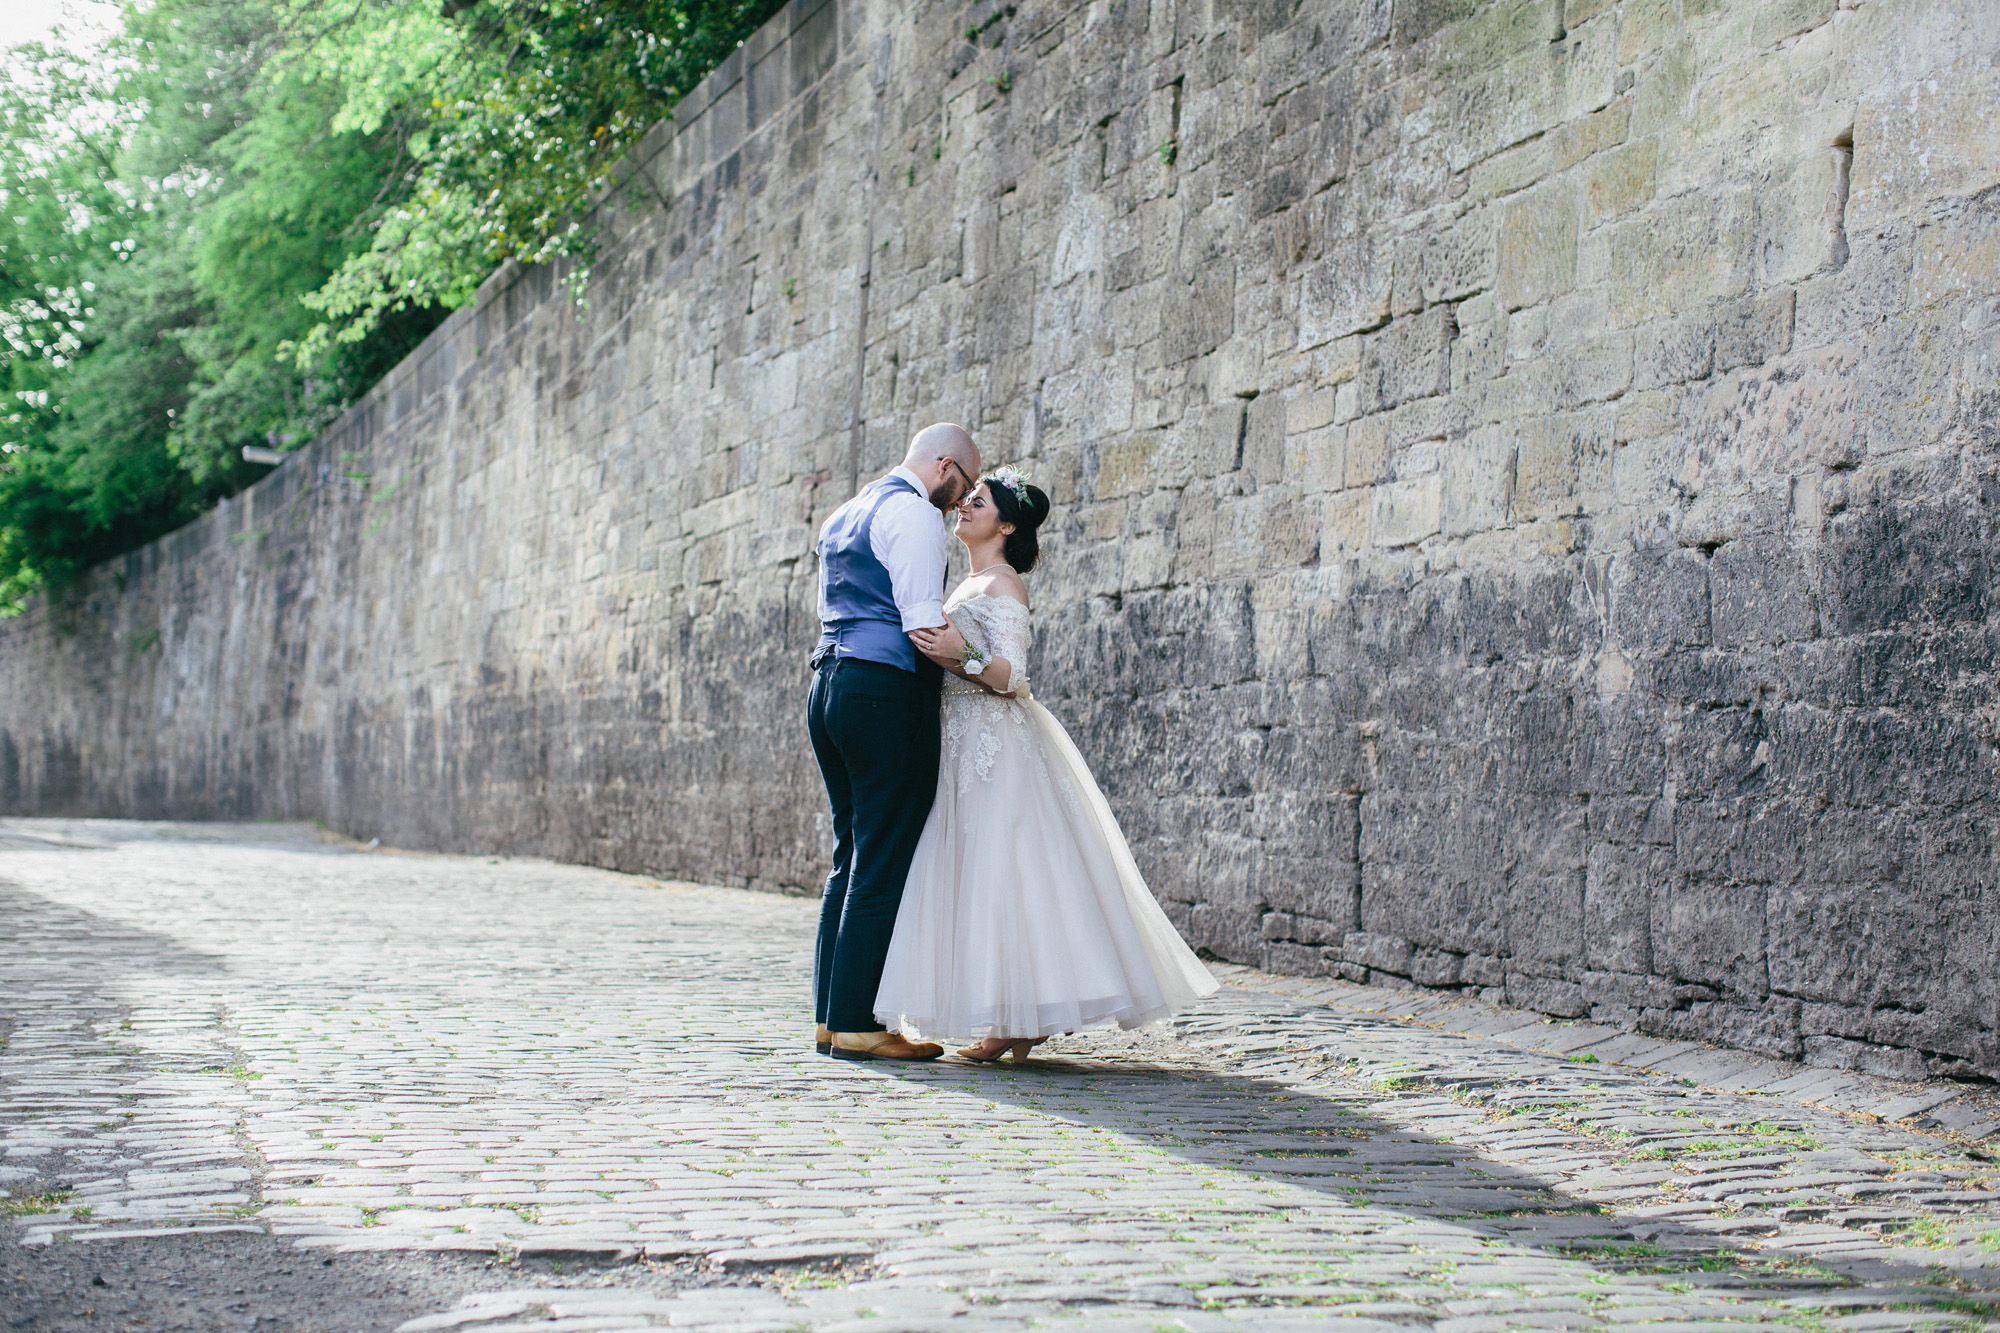 Quirky Wedding Photography Glasgow West End 060.jpg